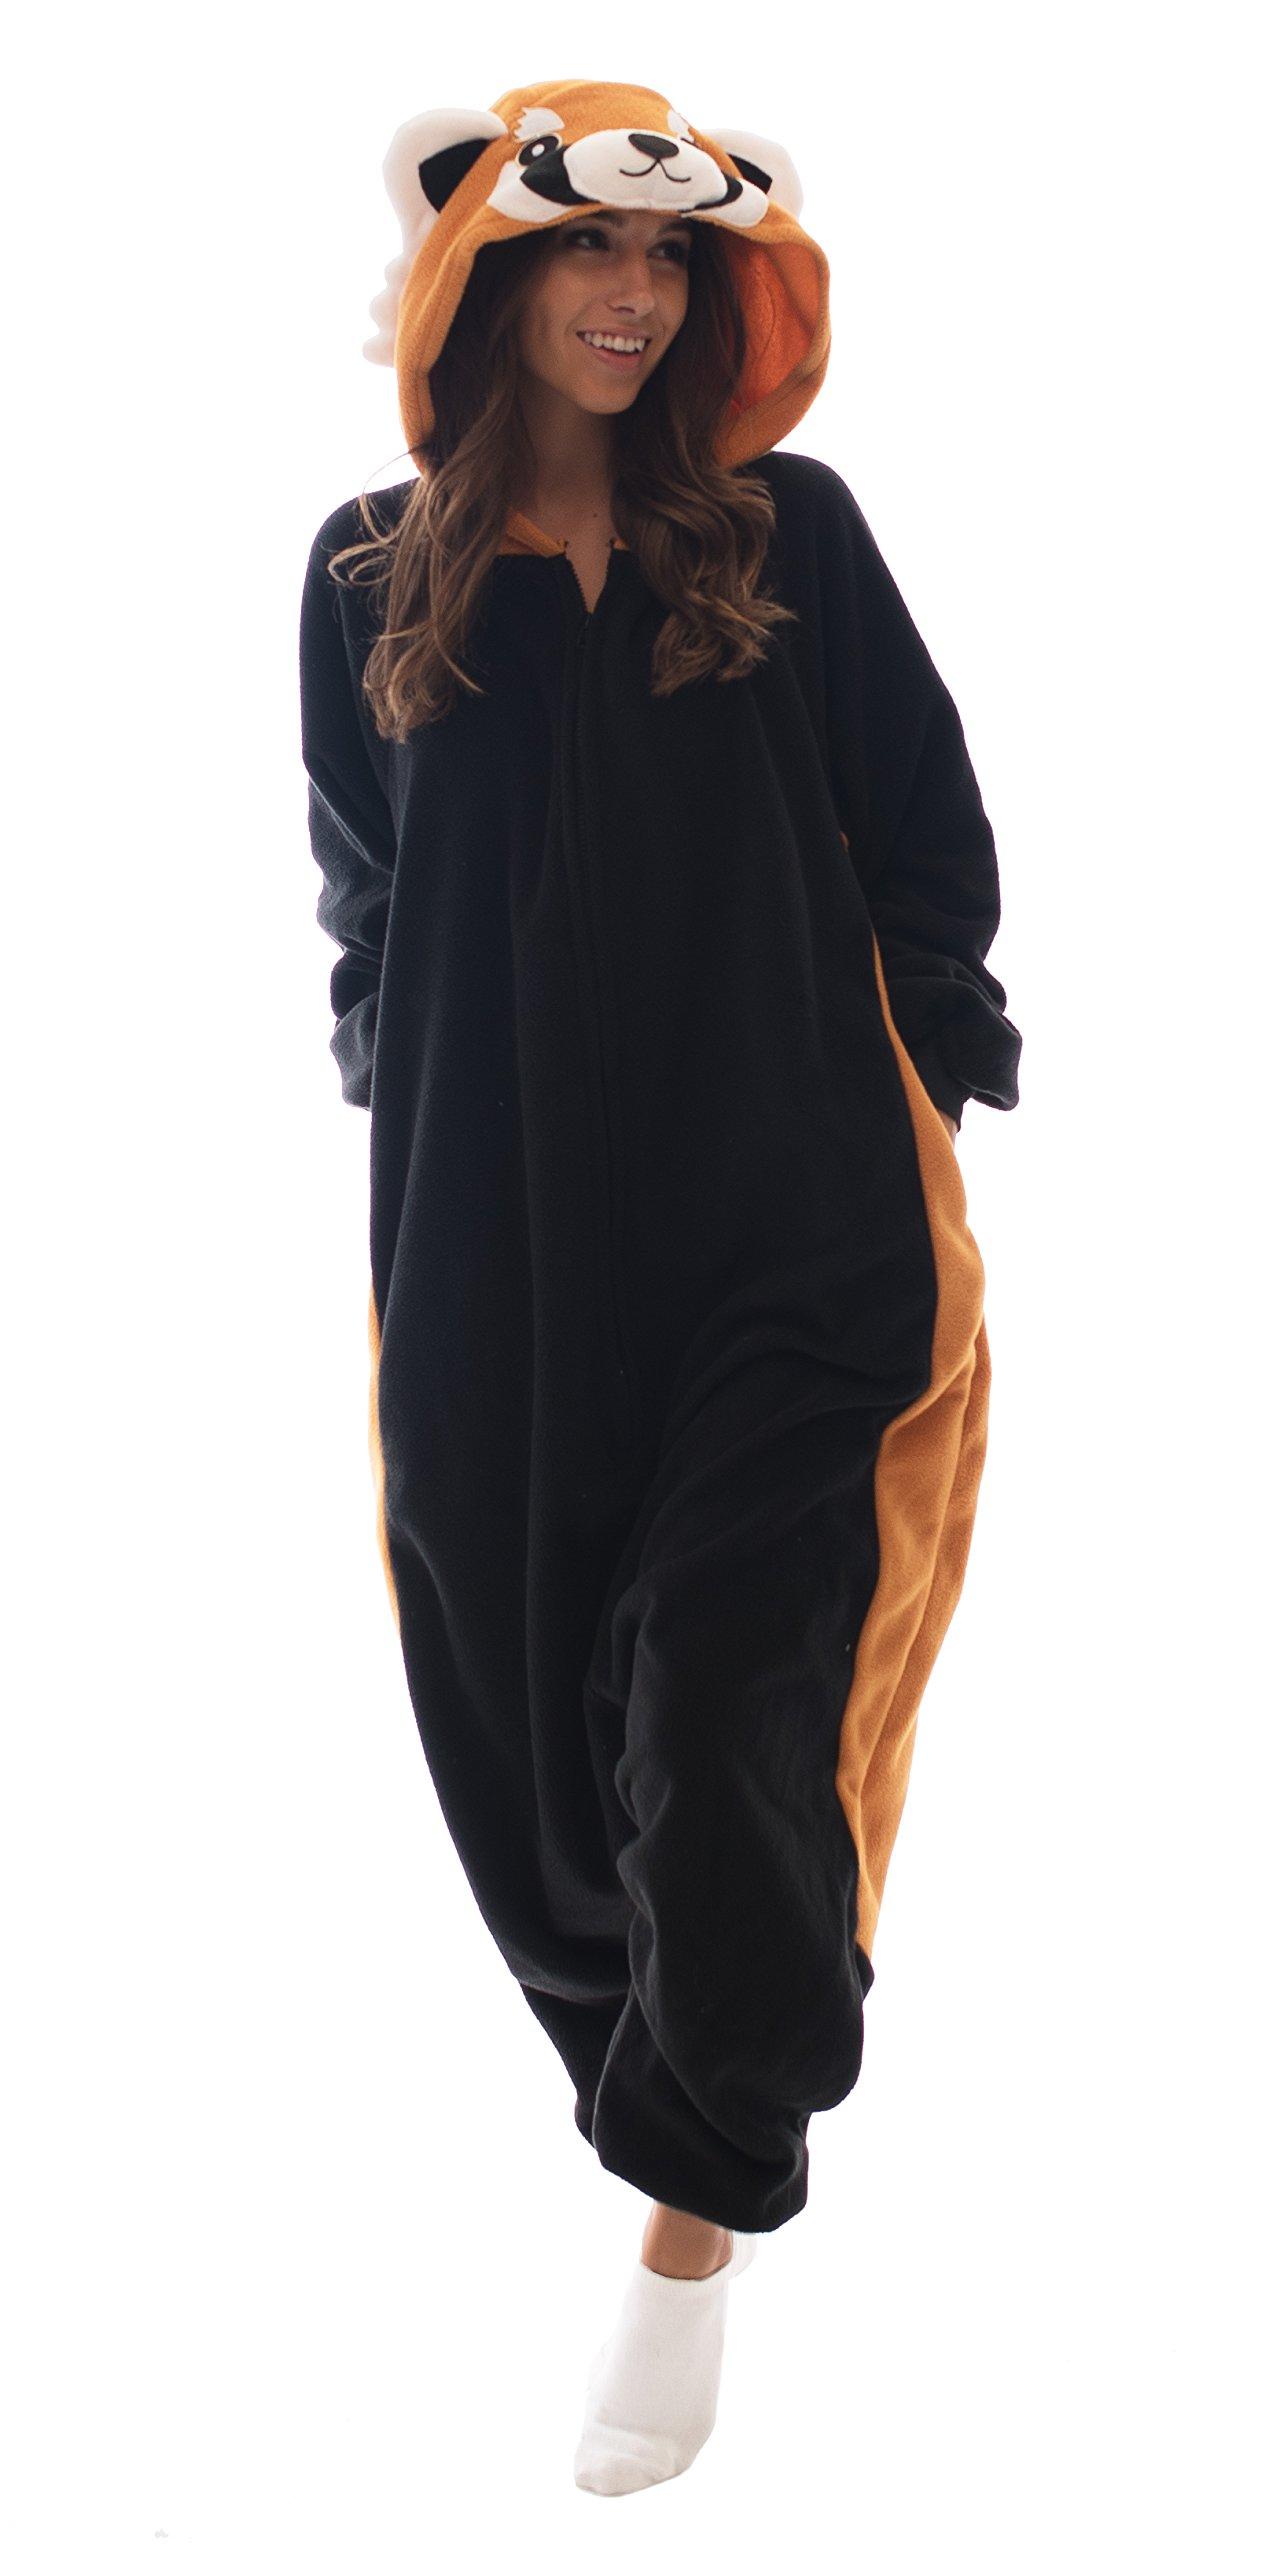 Adult Onesie Red Panda Animal Pajamas Comfortable Costume with Zipper and Pockets (Medium)